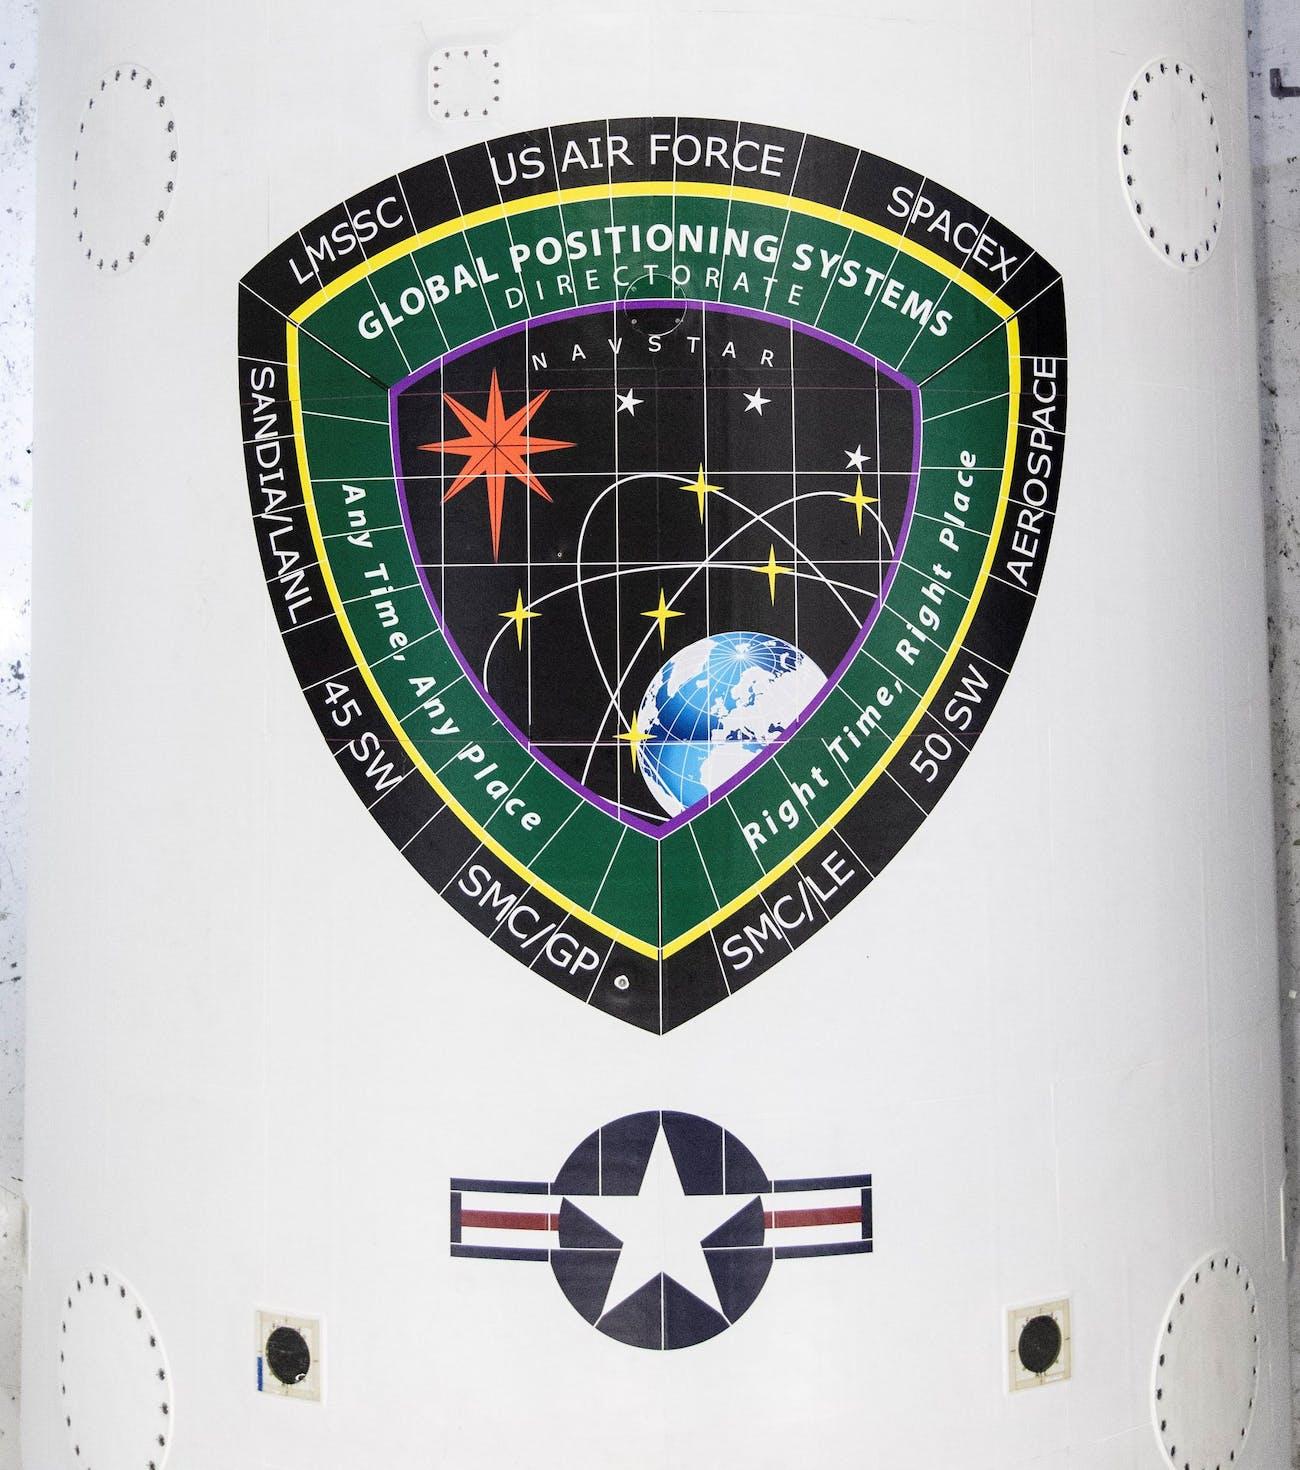 The GPS logo on the rocket.